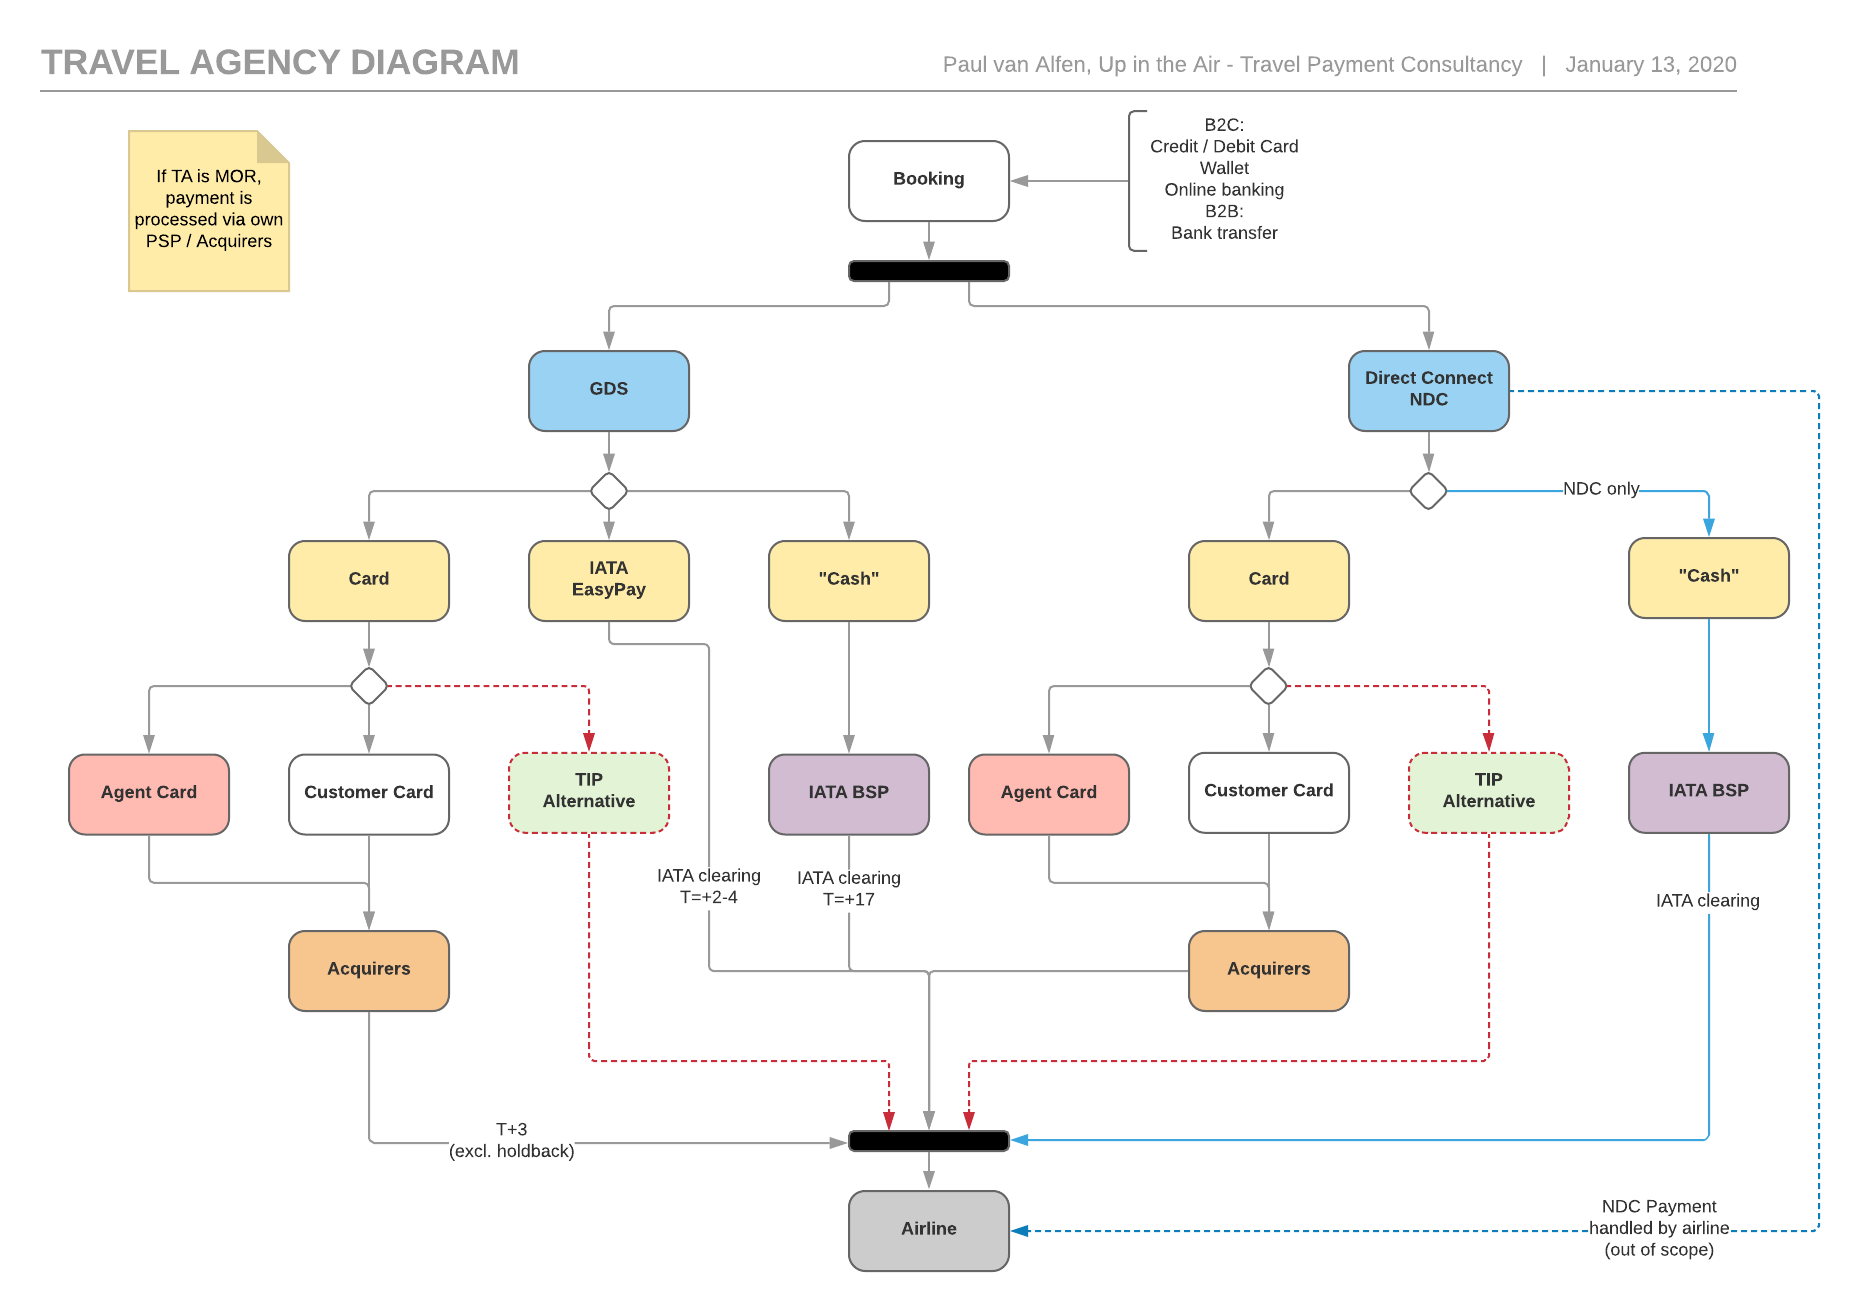 Travel Agency Diagram